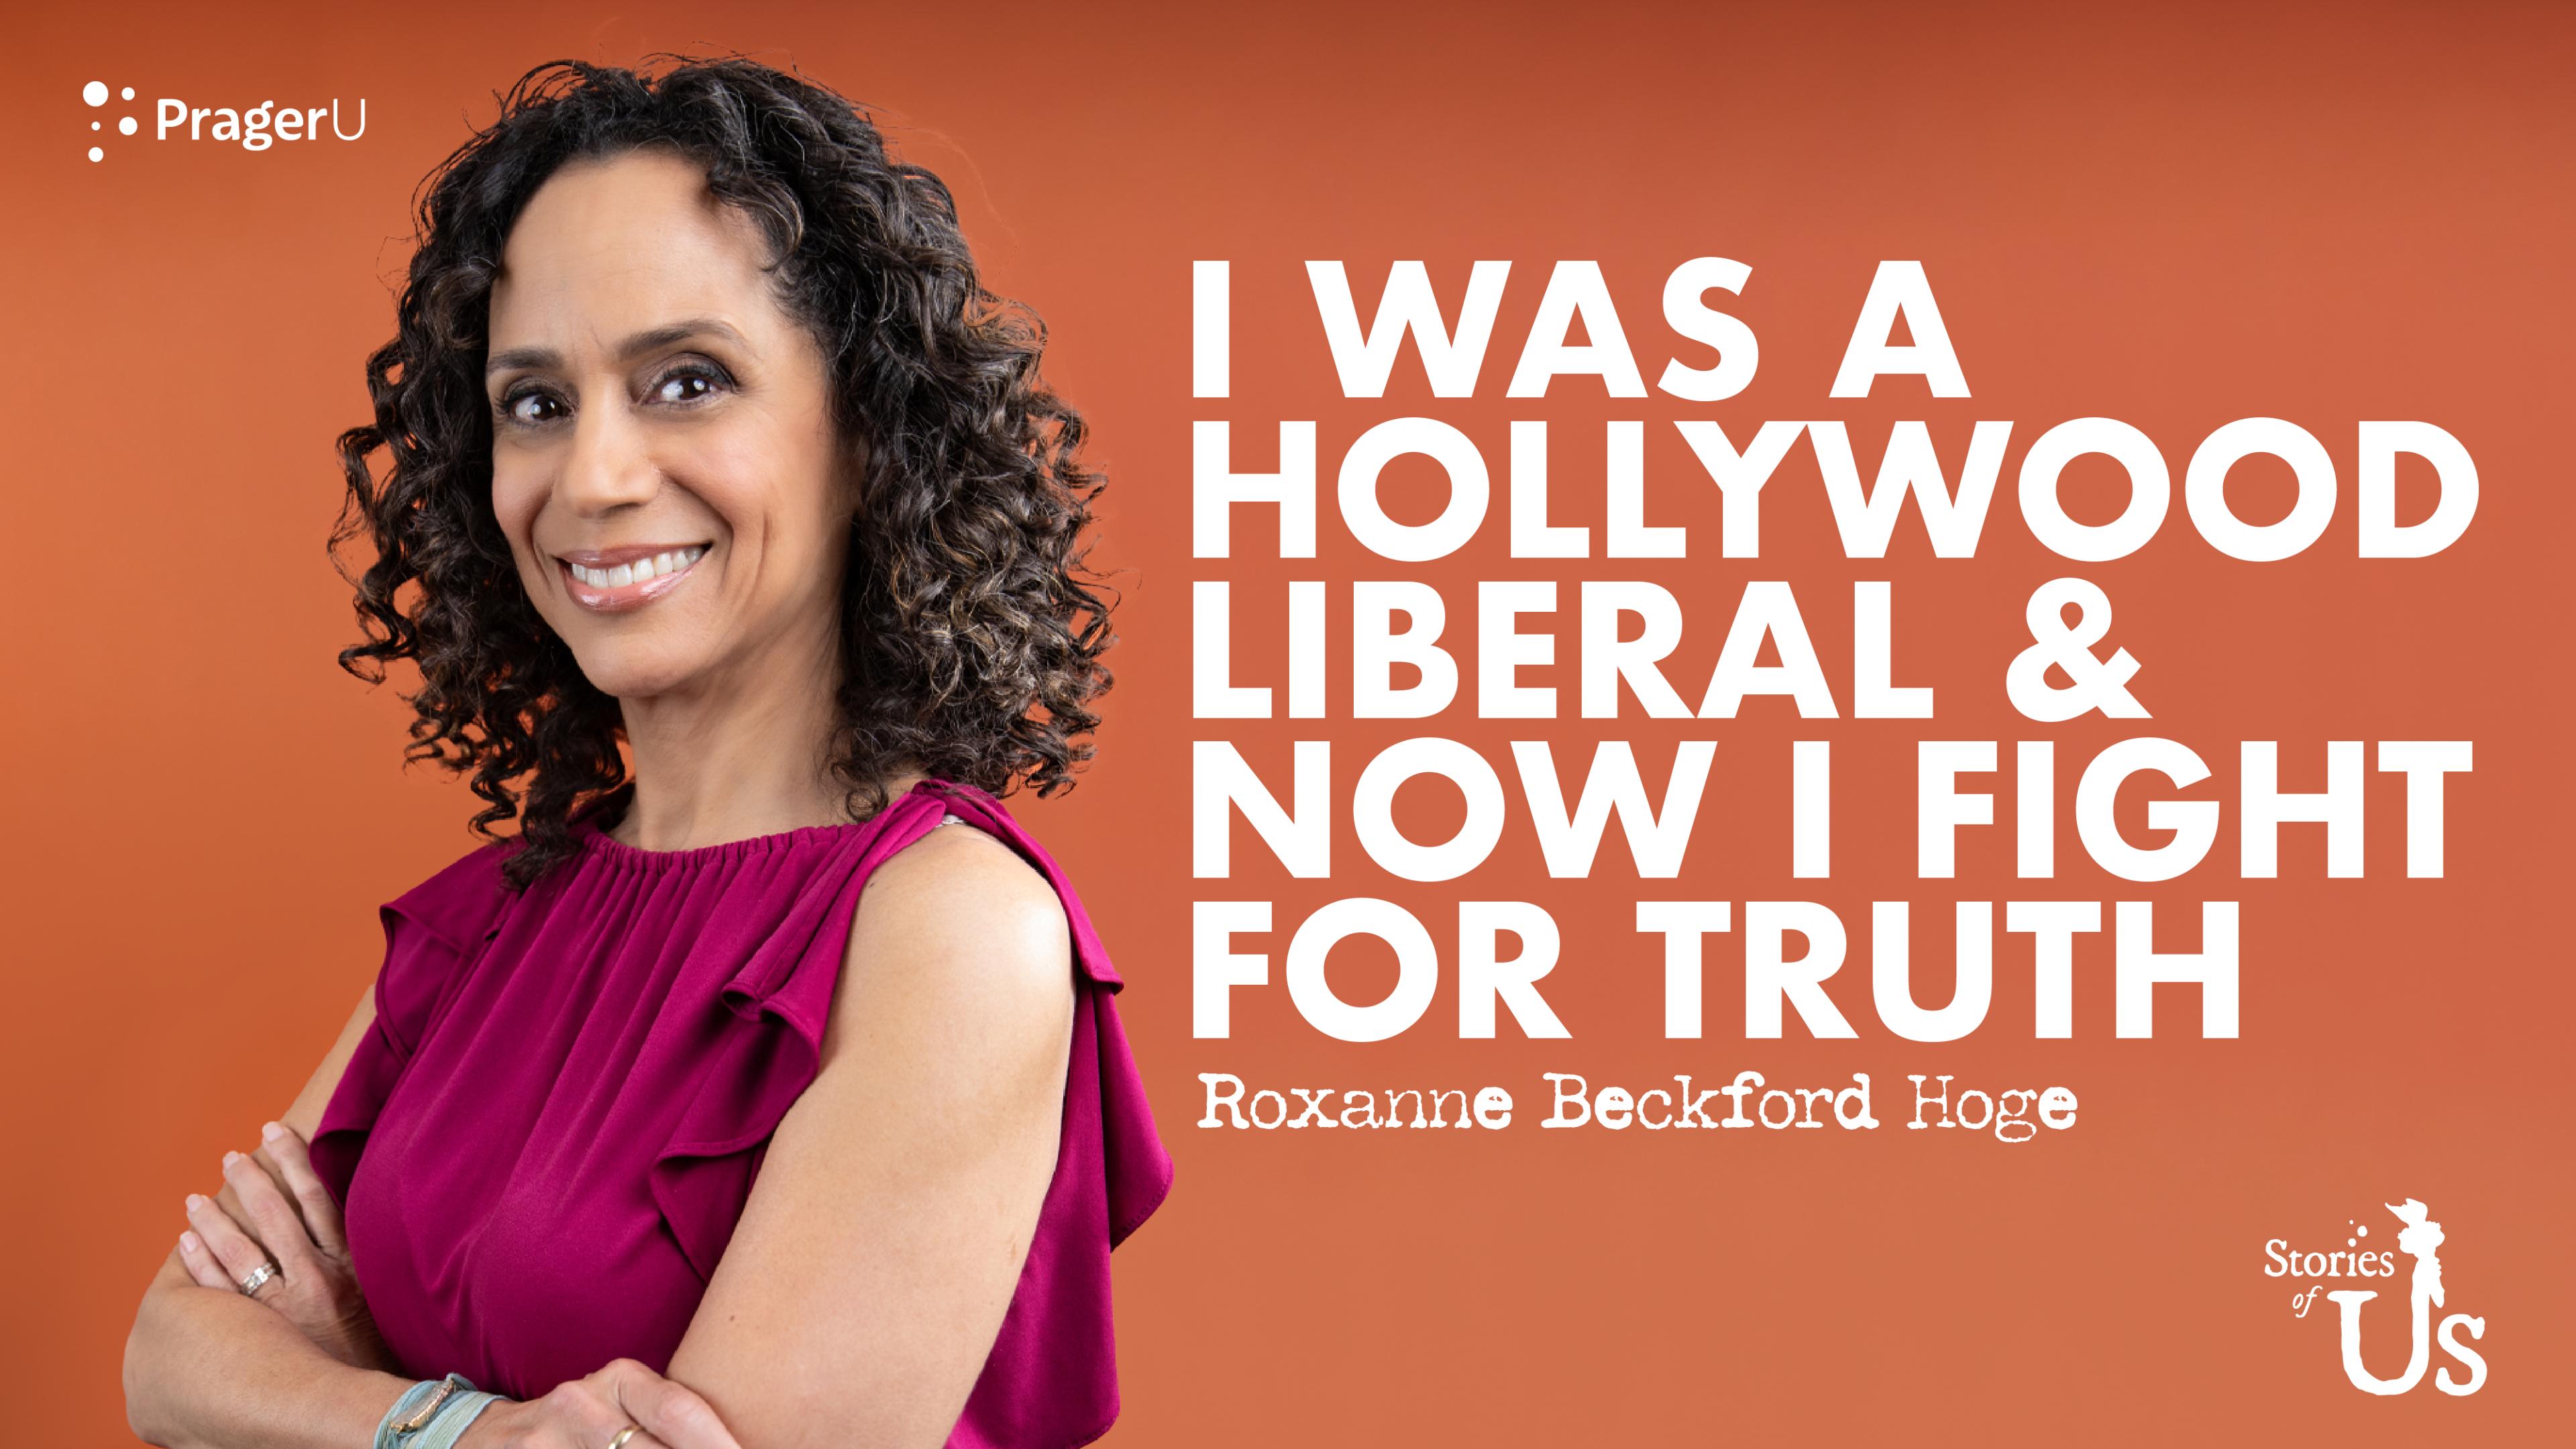 Stories of Us: Roxanne Beckford Hoge